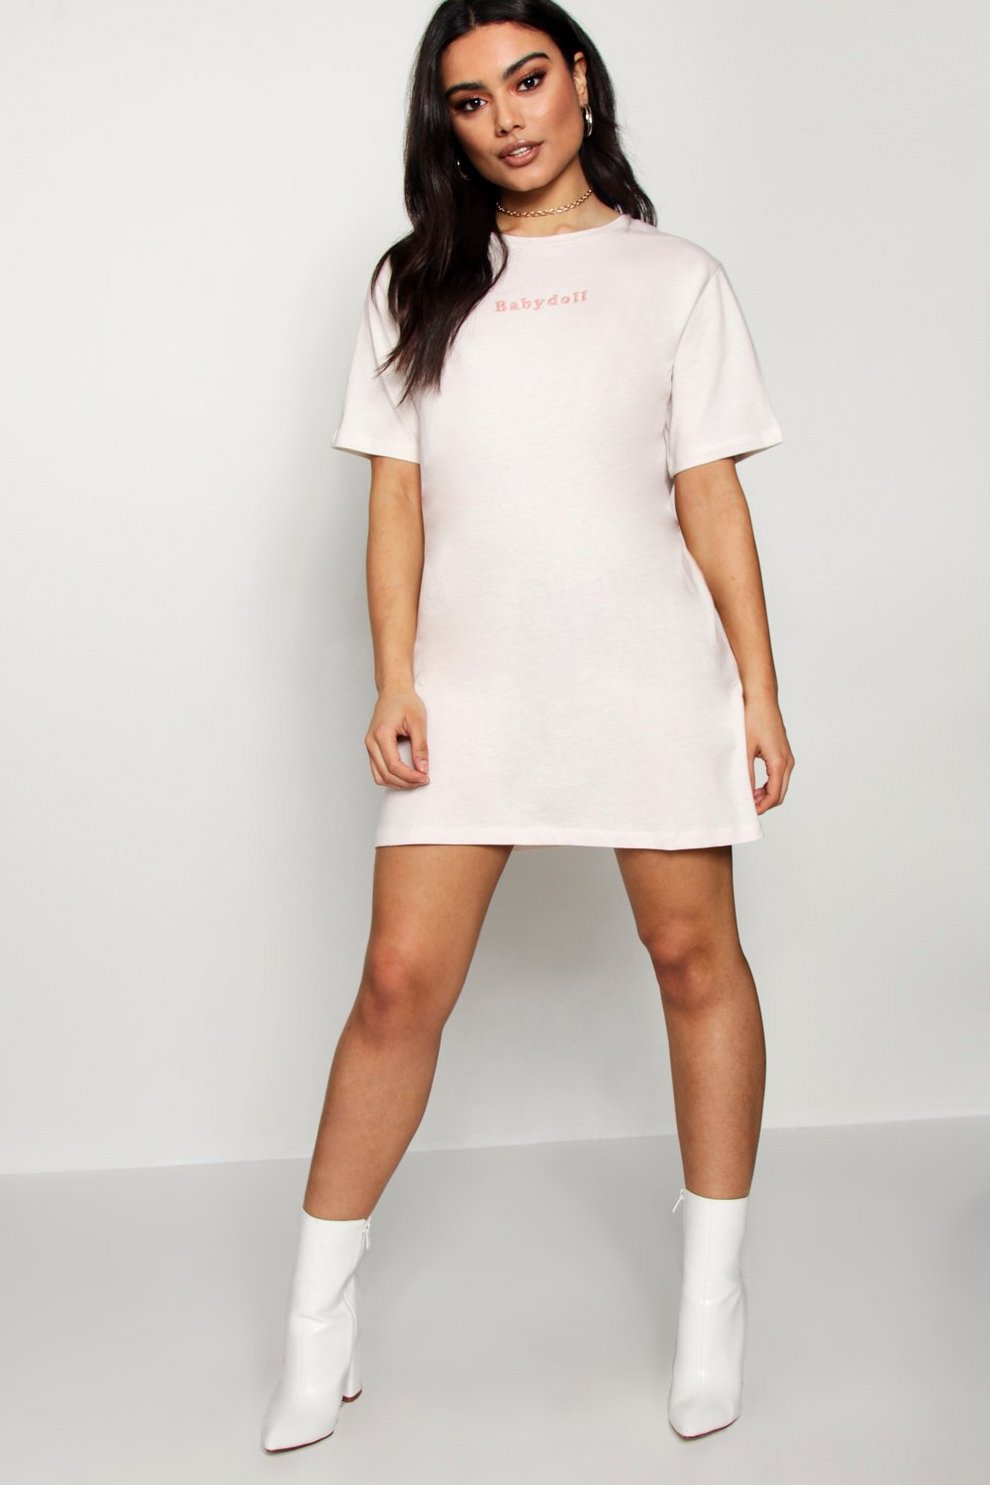 ad054f28f Vestido estilo camiseta con bordado a tono para niña